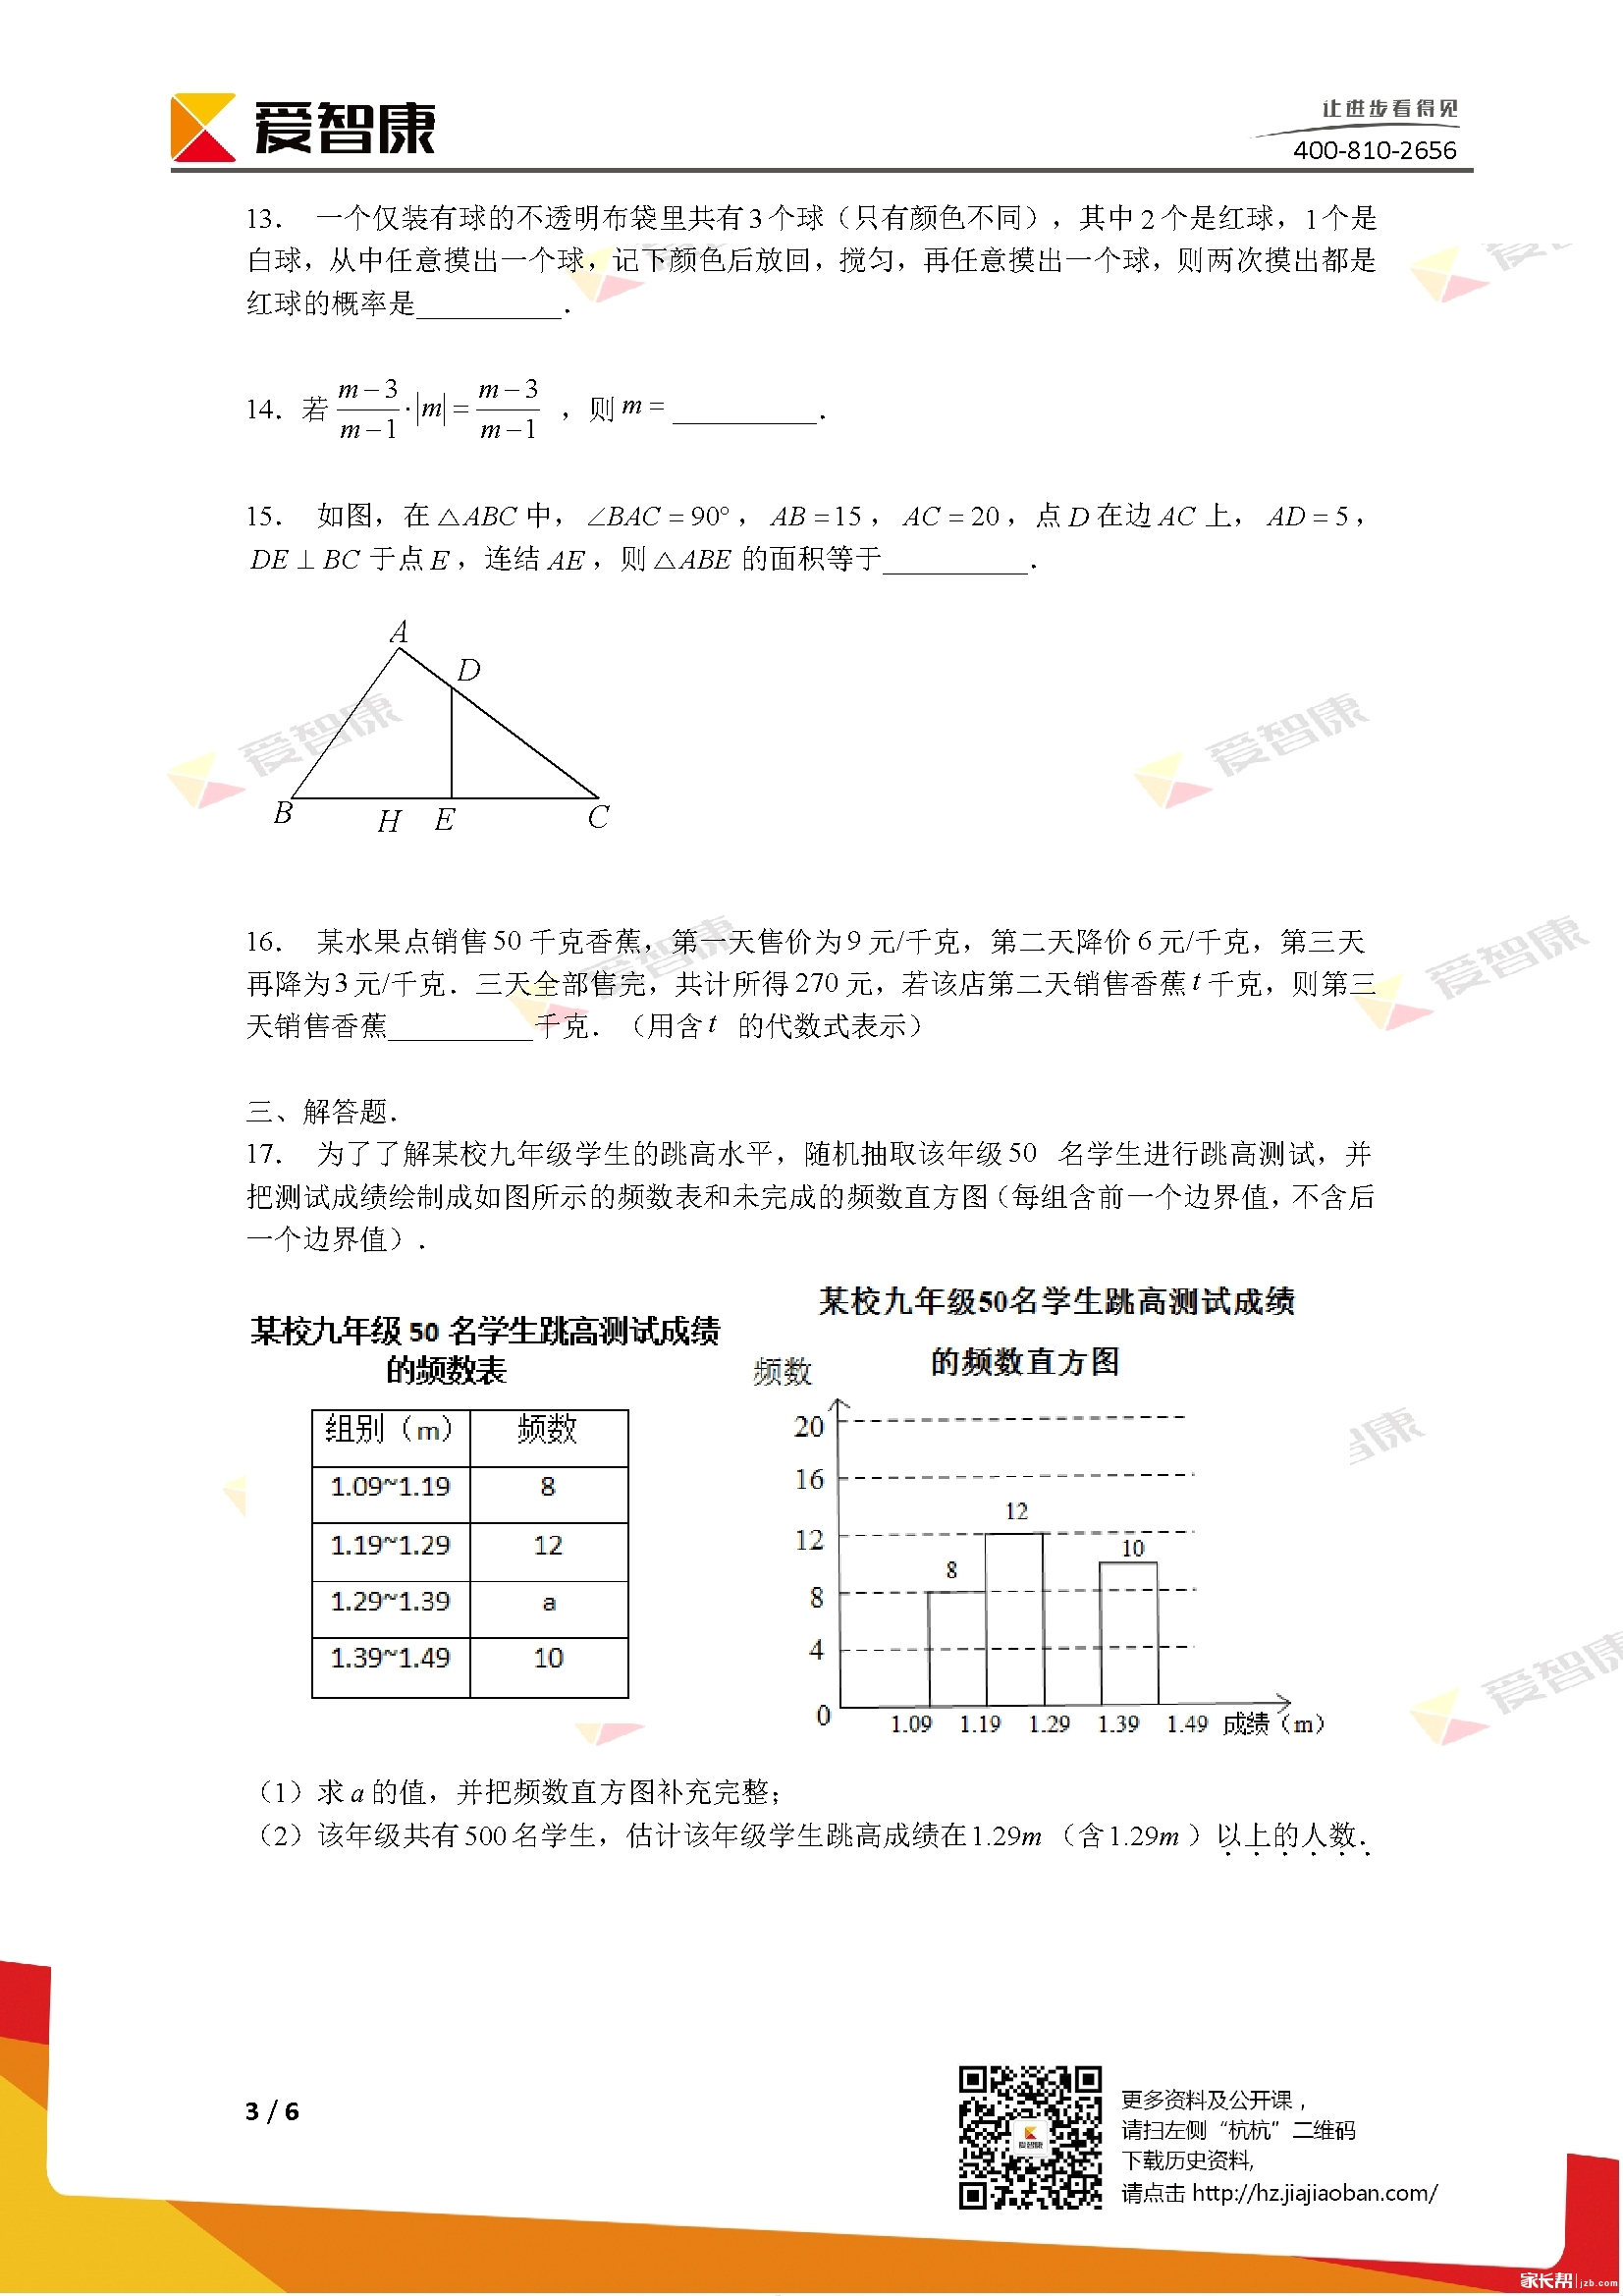 Microsoft Word - 2017年杭州市中考数学试卷23.jpg